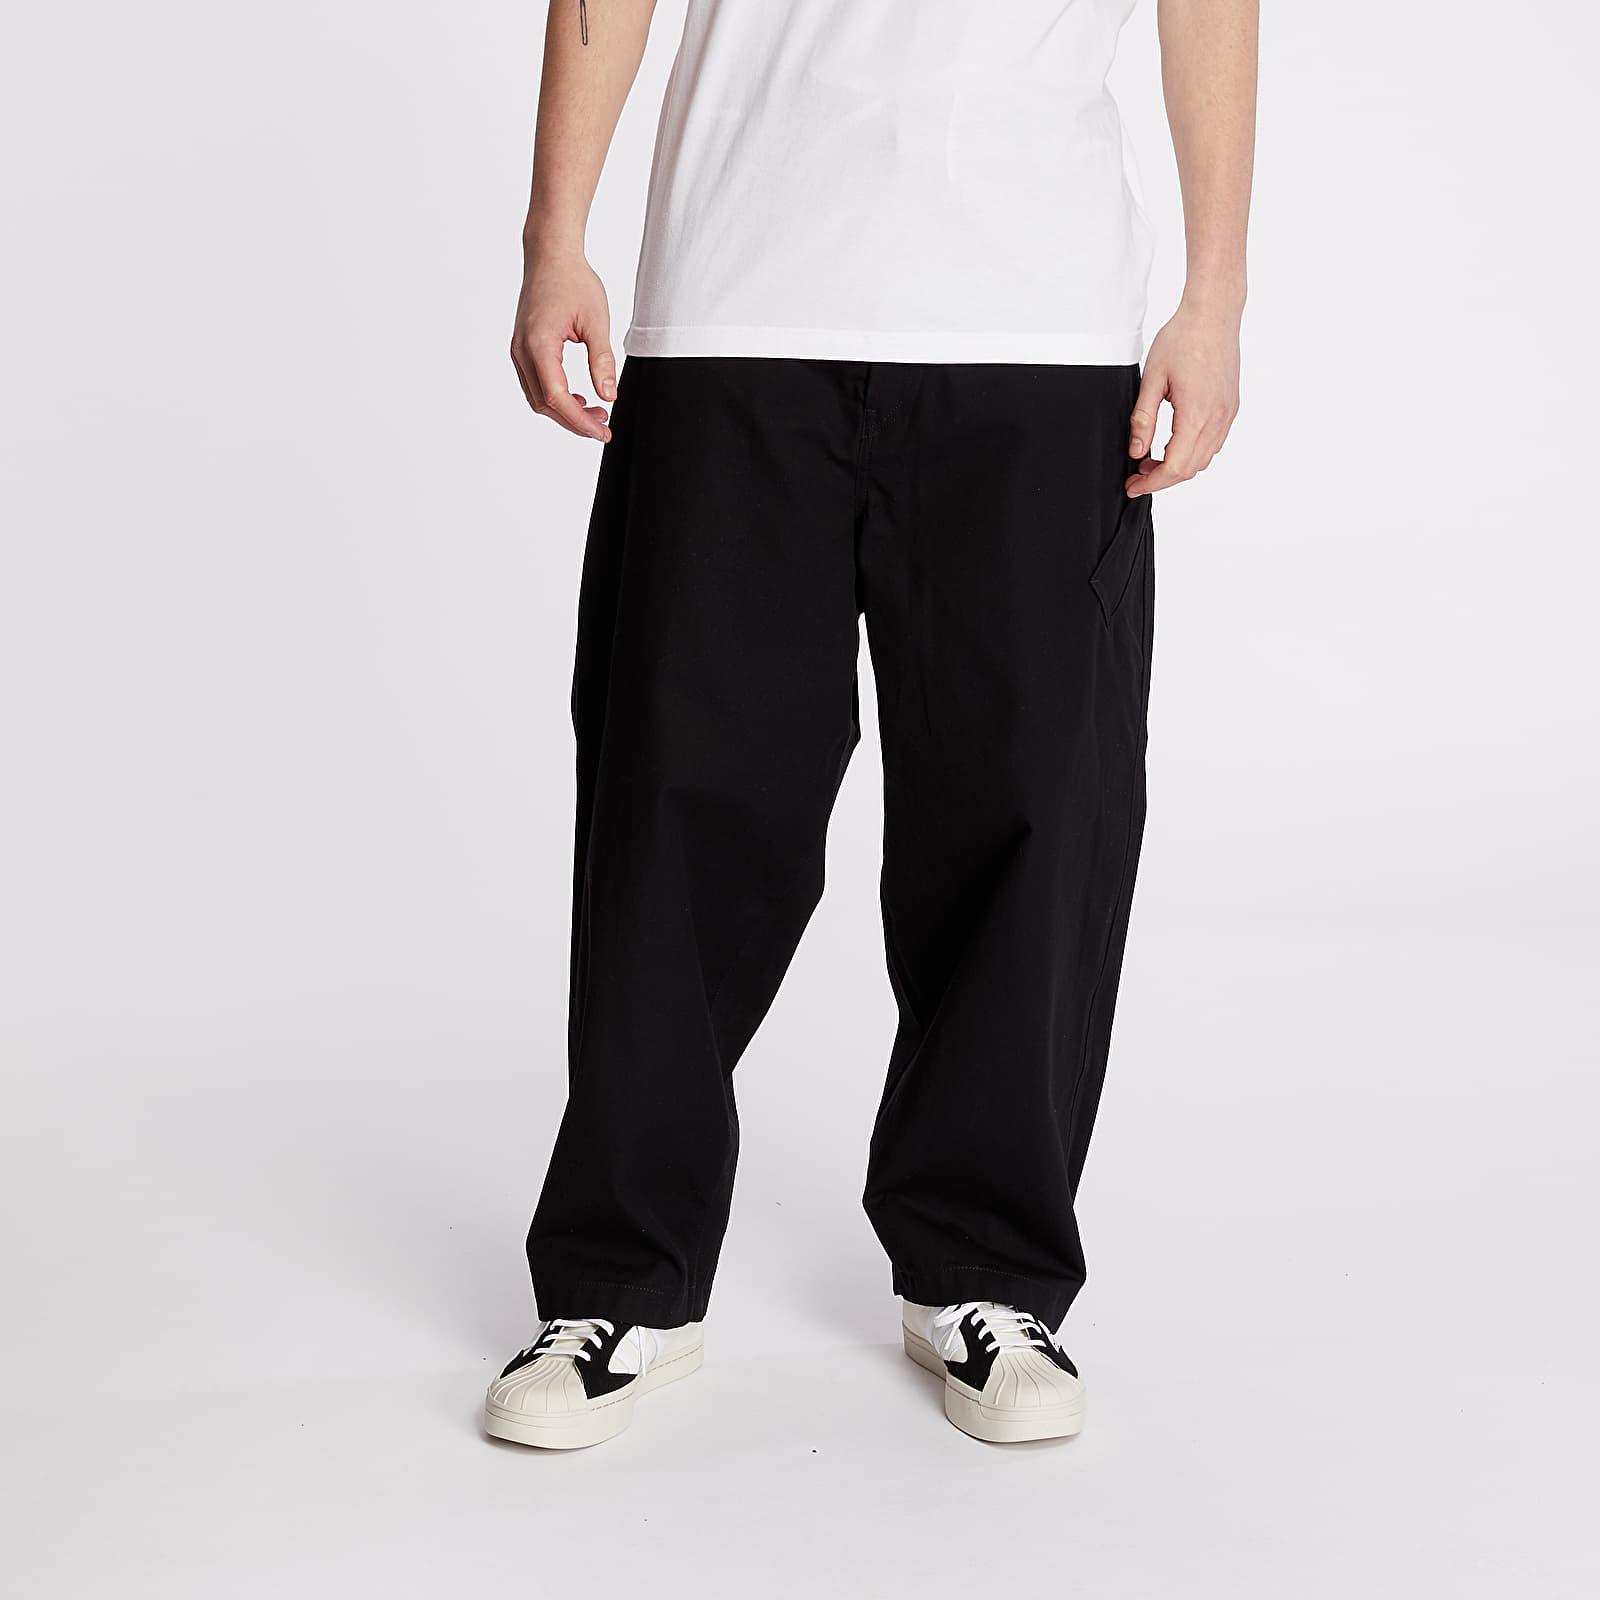 Y-3 Workwear Wide Pants